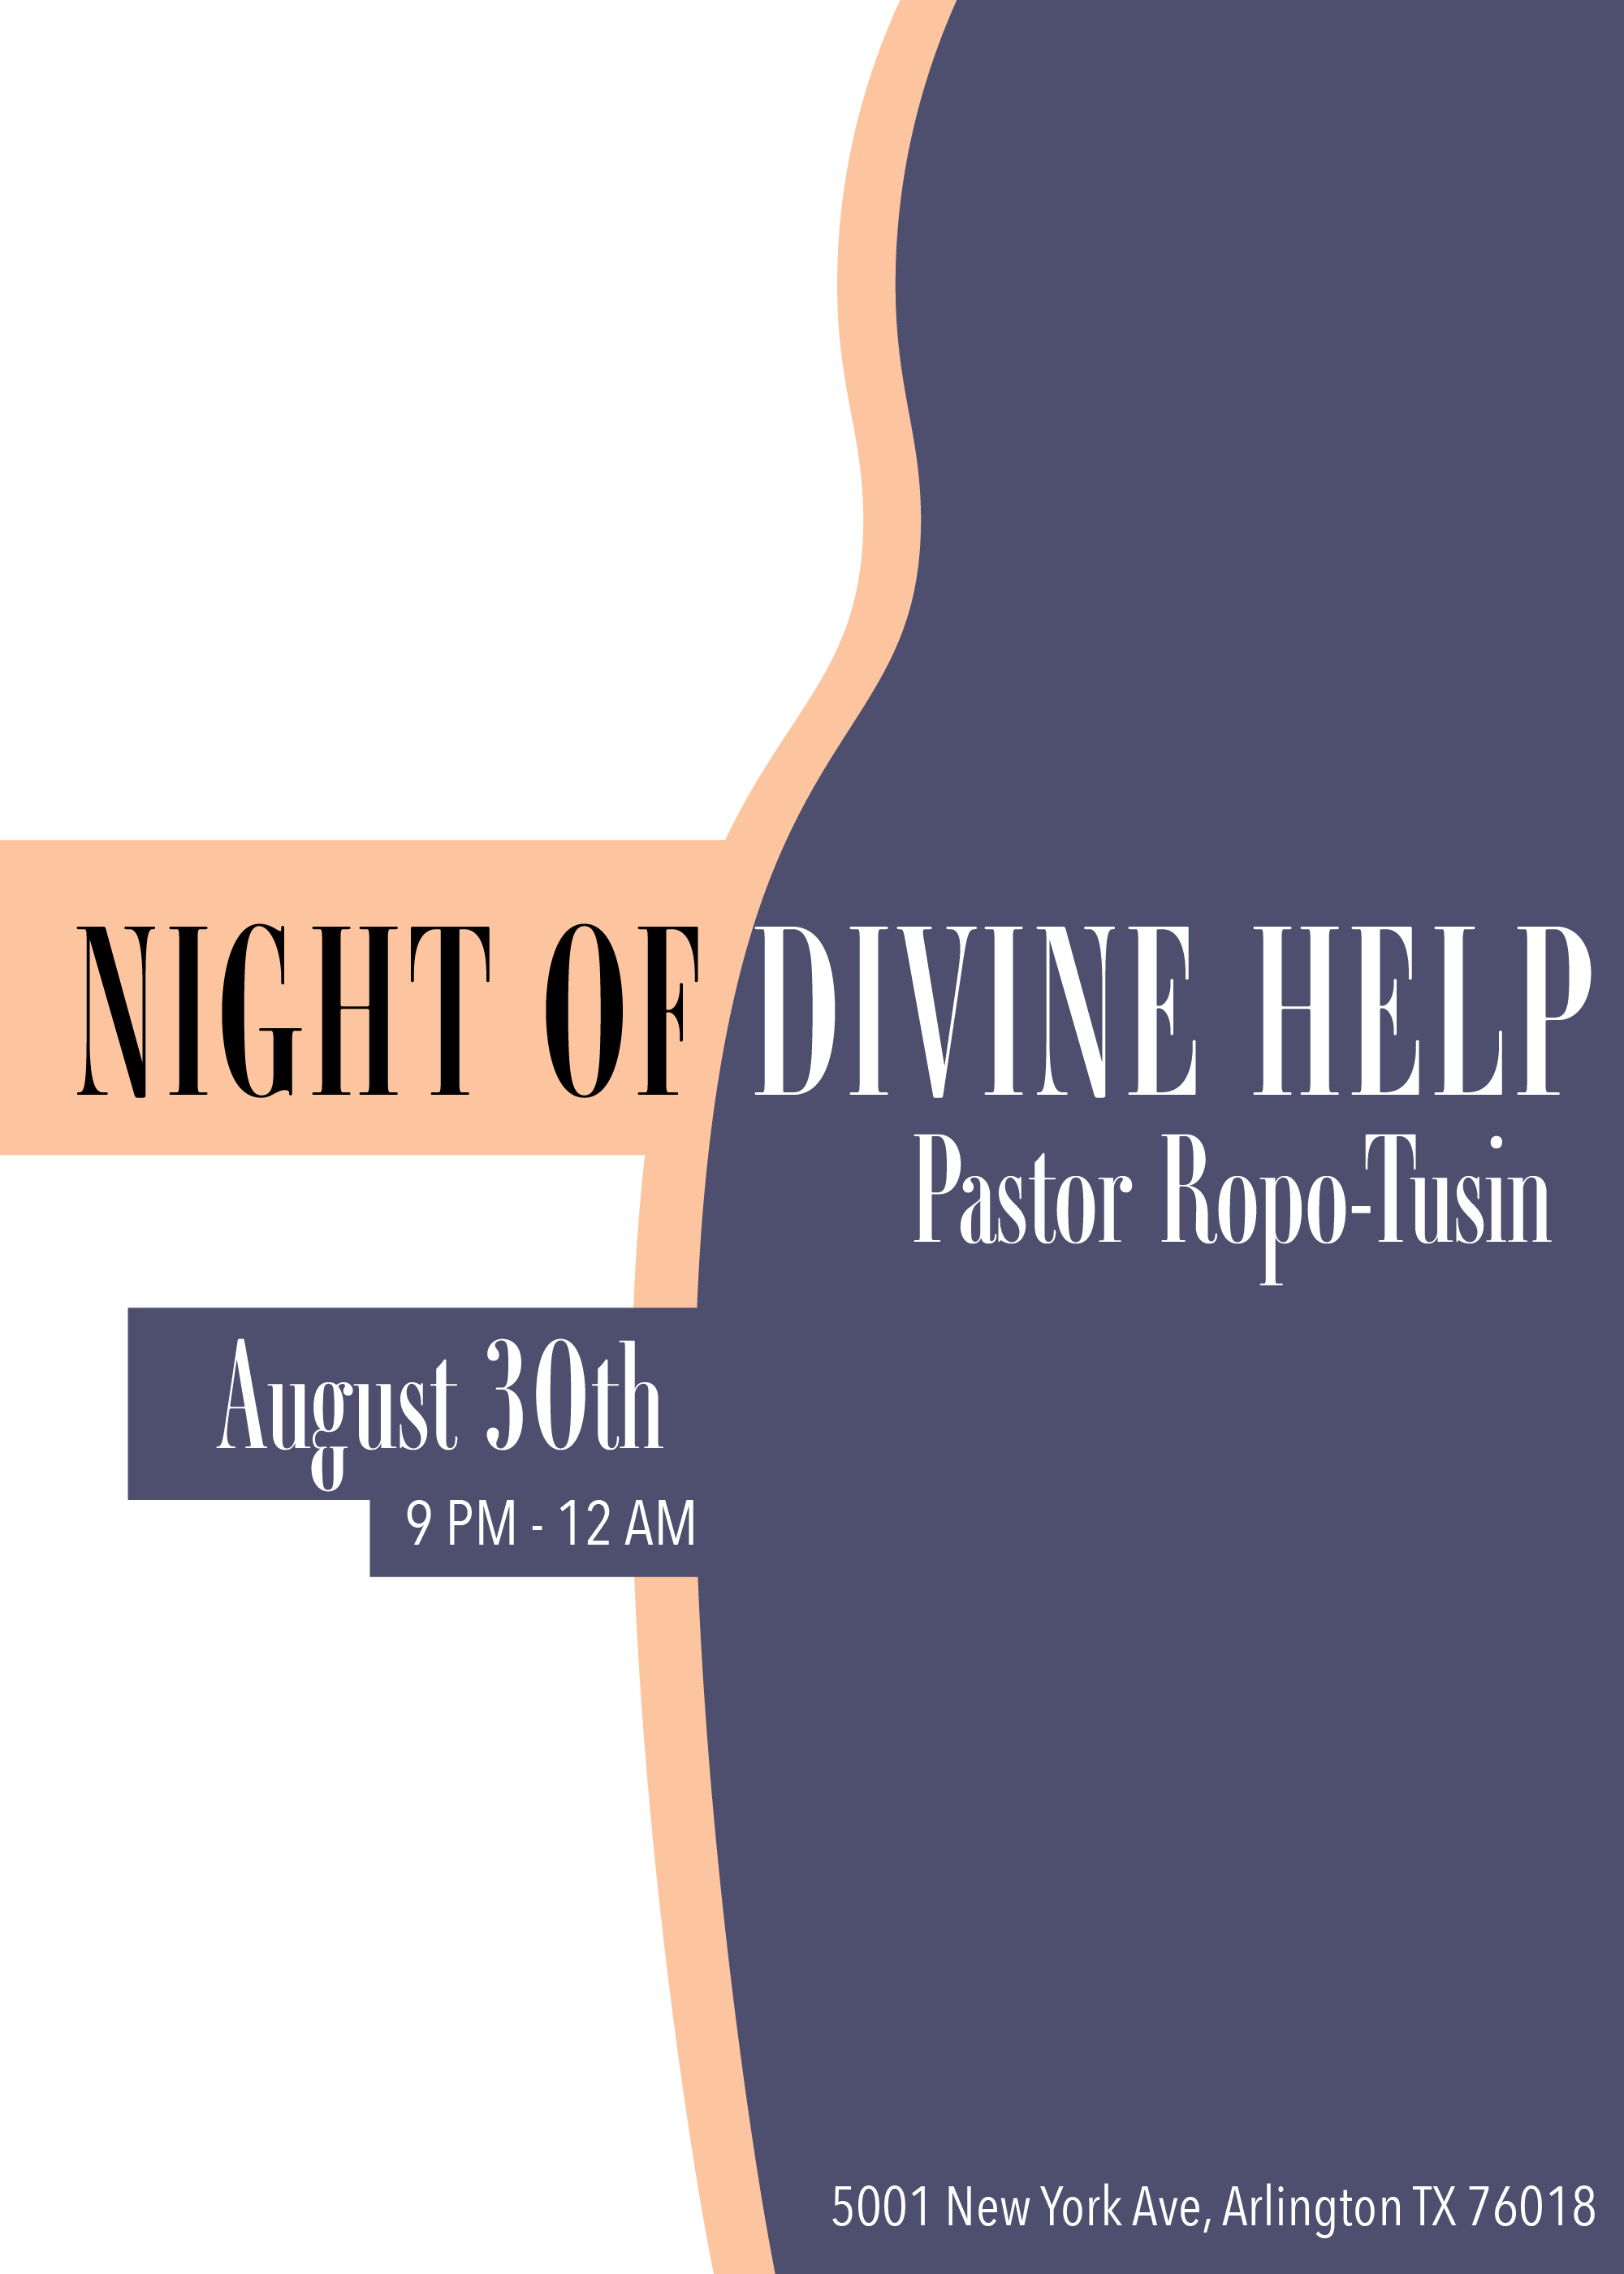 Night of Divine Help